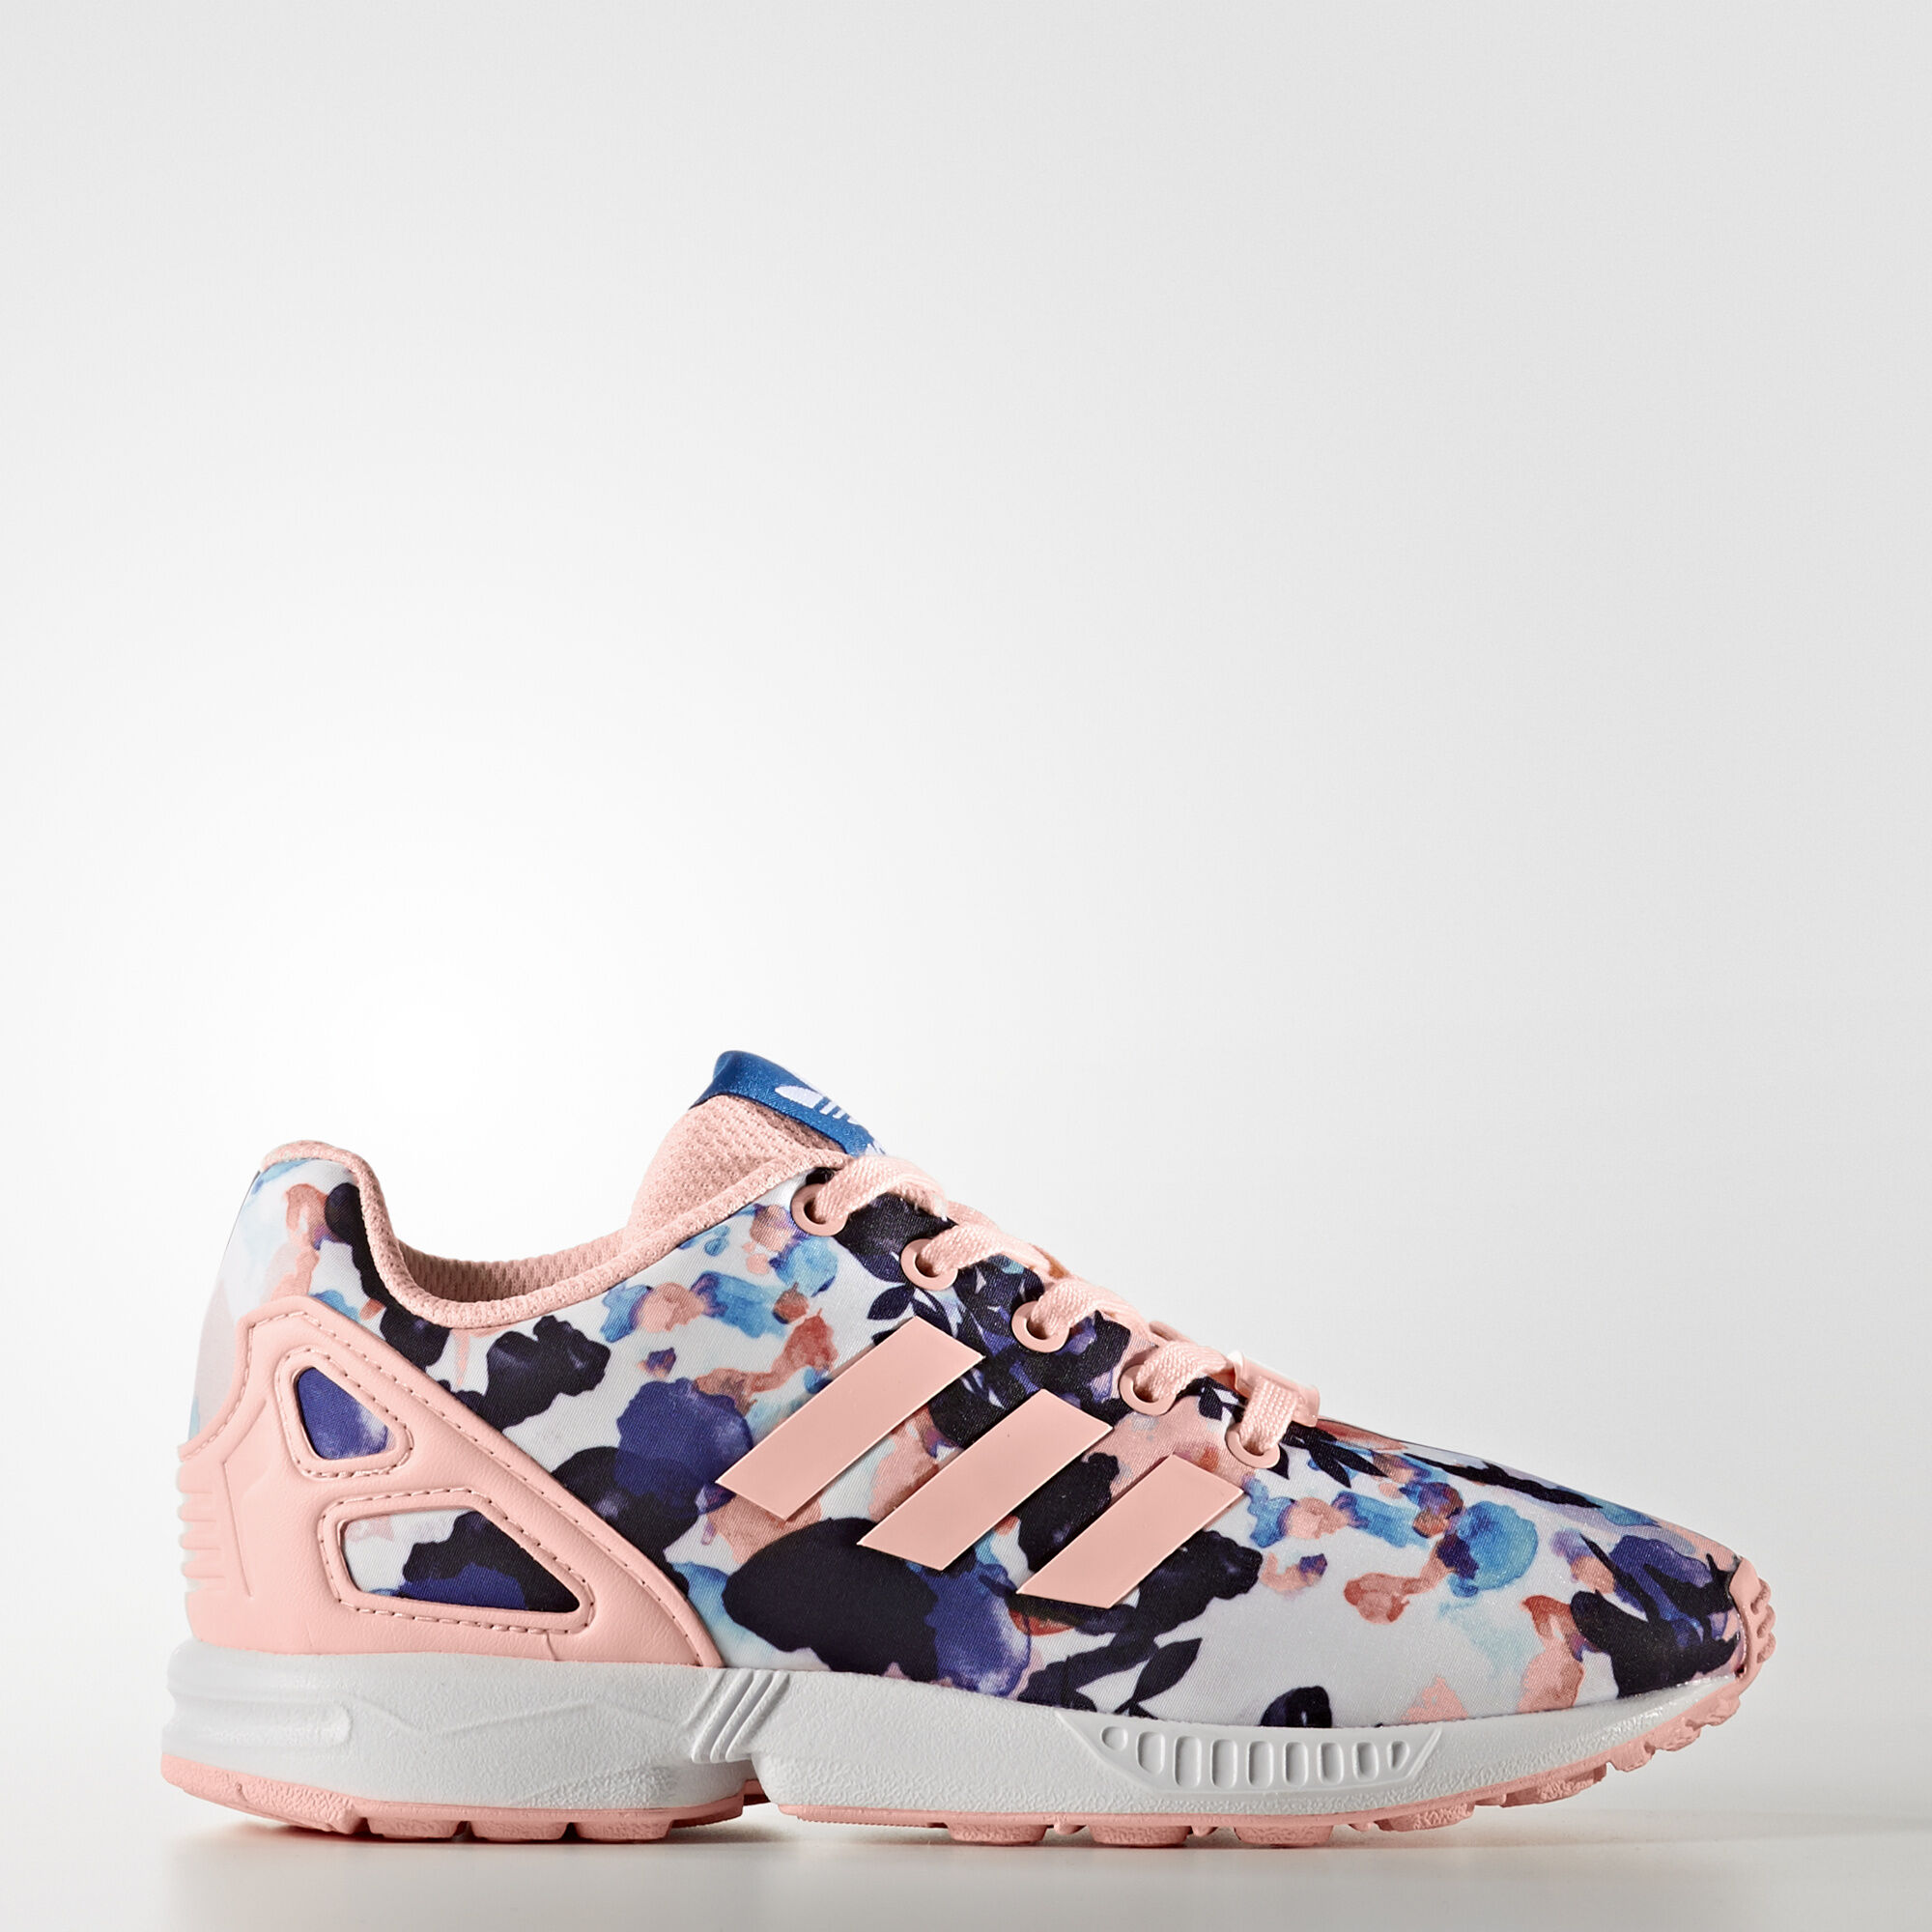 adidas zx on sale >off62% di sconti